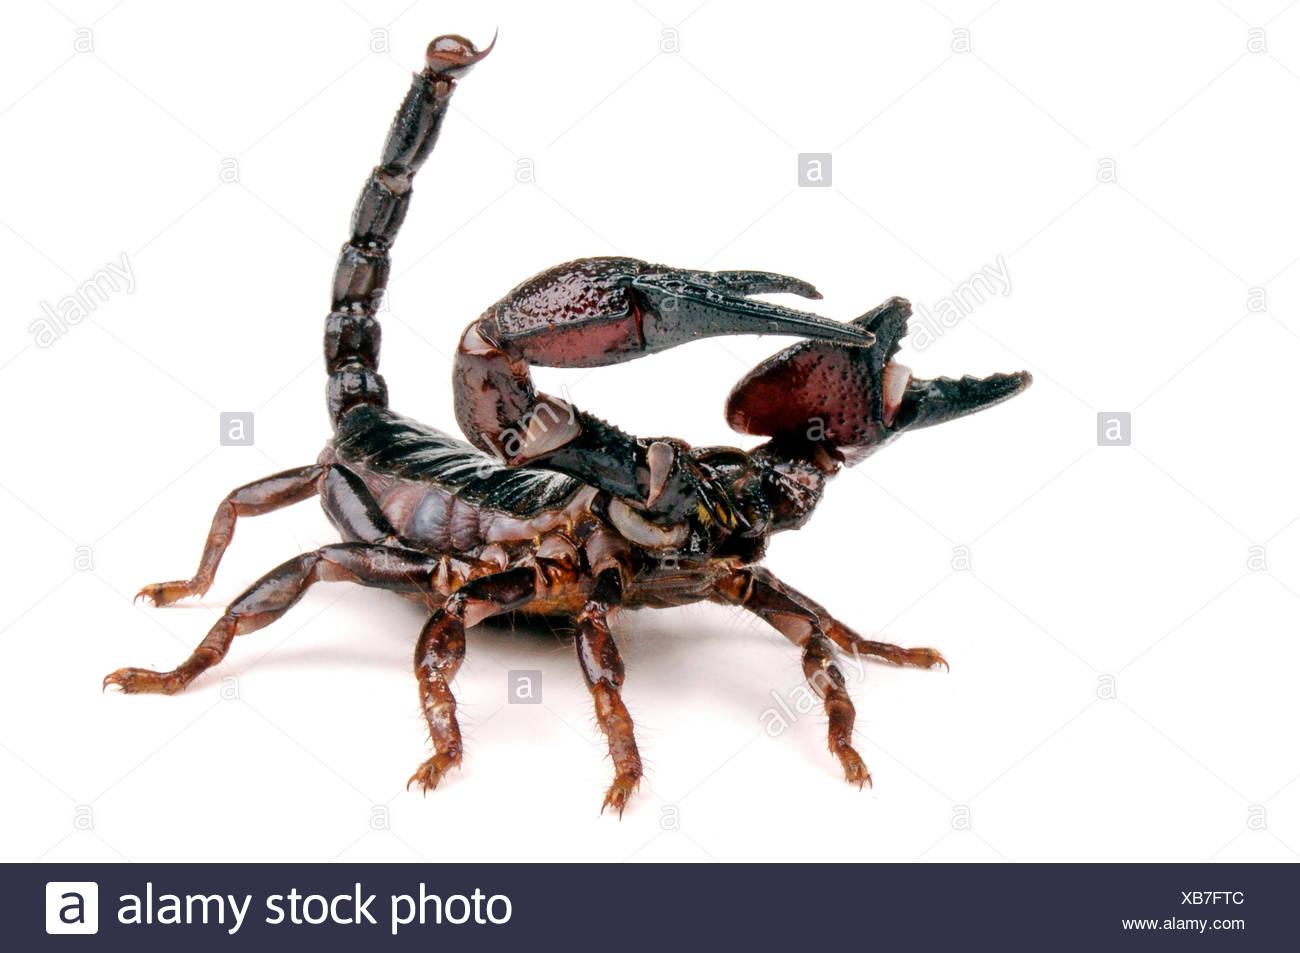 Tanzanian Red Clawed Scorpion (Pandinus cavimanus), in defence posture - Stock Image